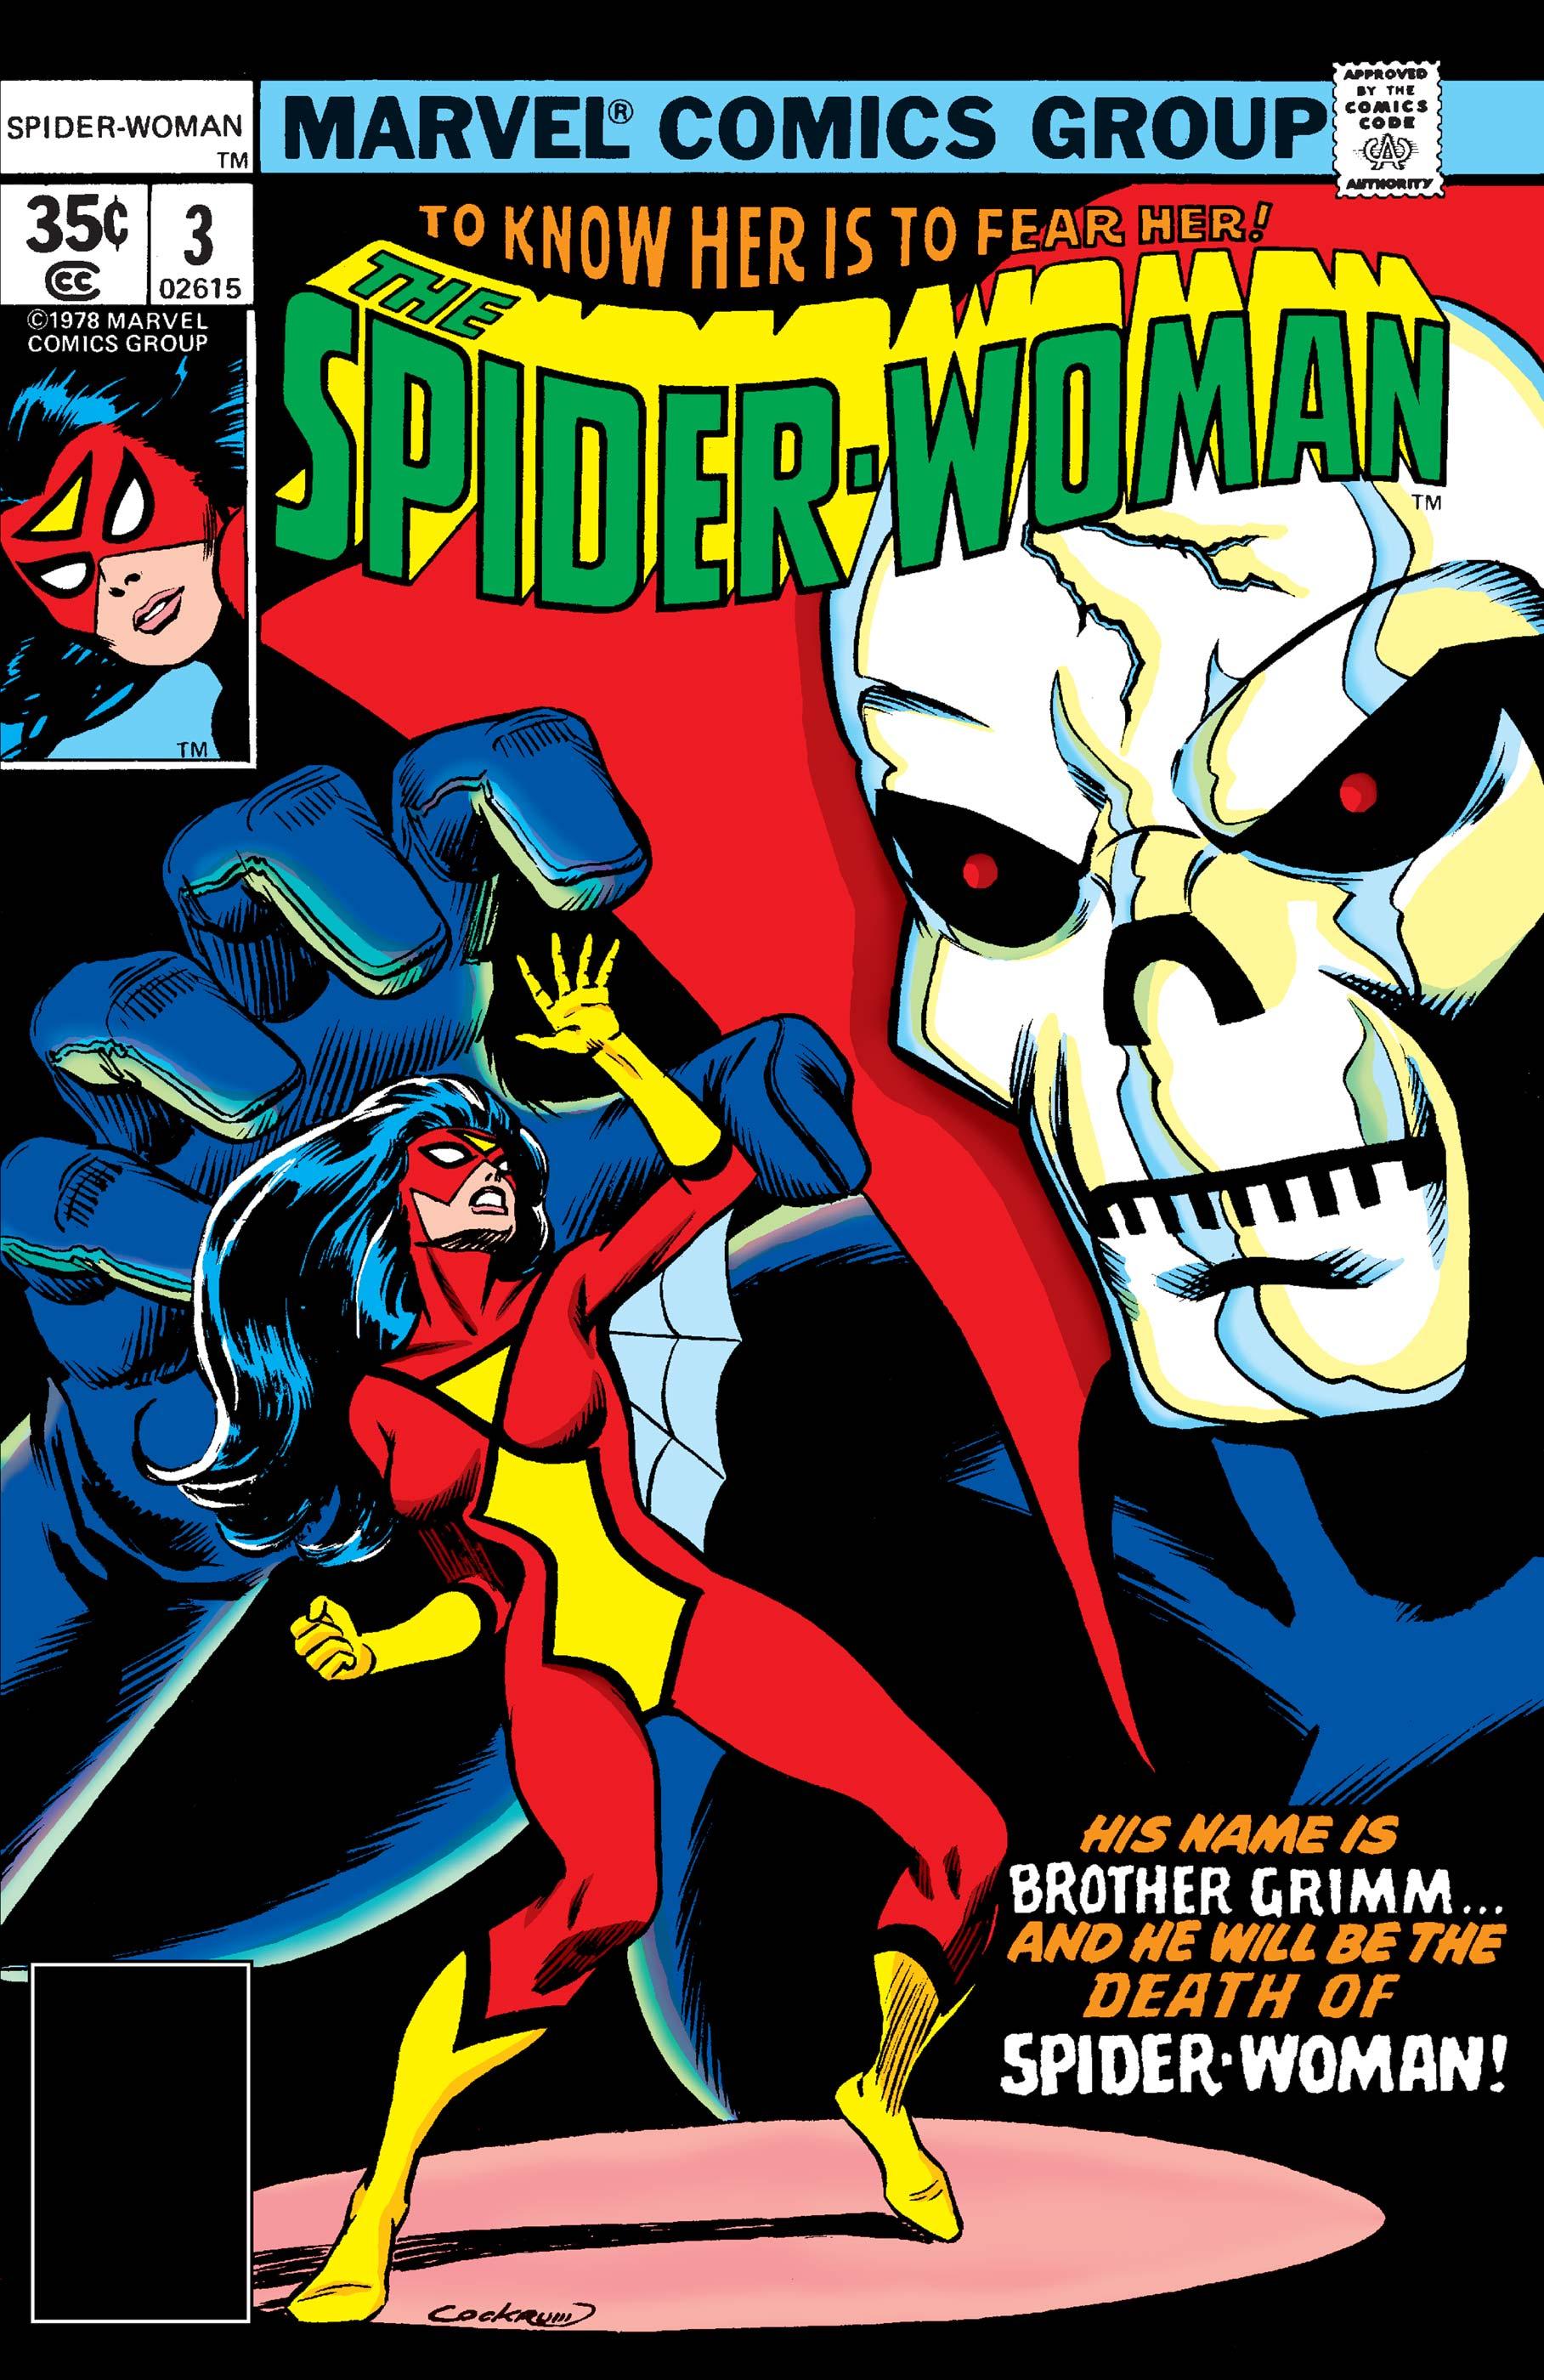 Spider-Woman (1978) #3